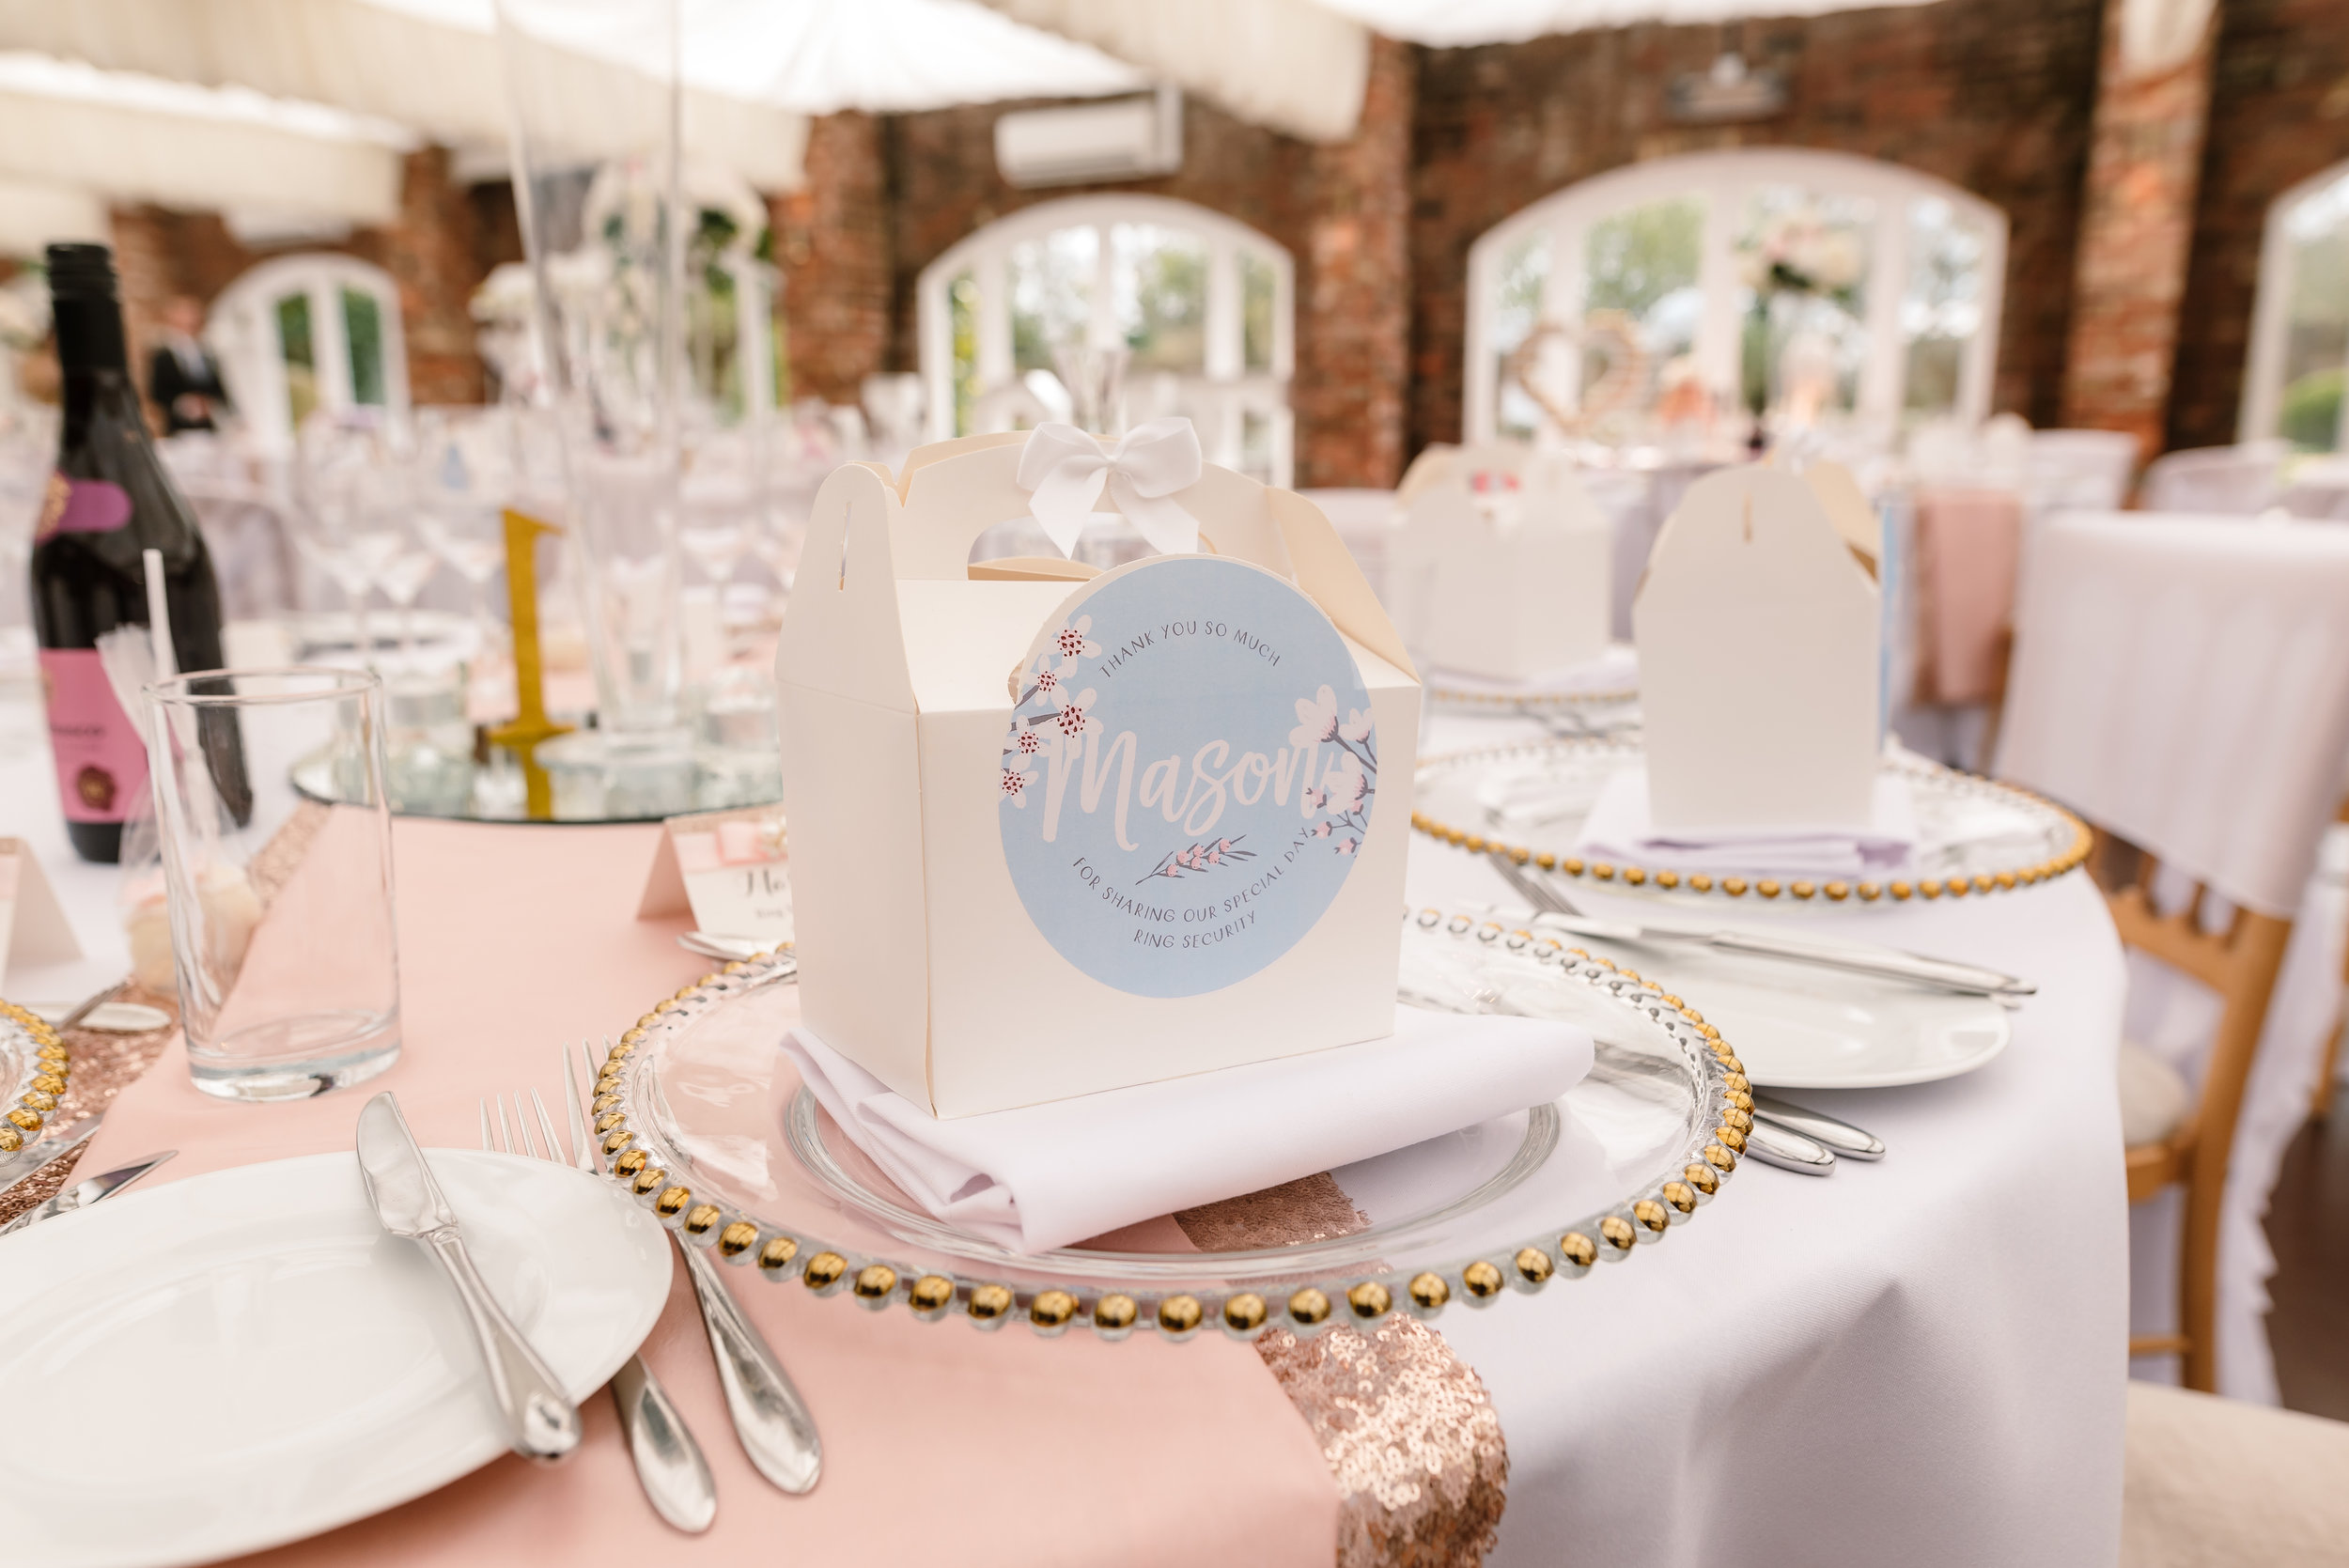 Sarah-Fishlock-Photography : Hampshire-wedding-photographer-hampshire : fleet-wedding-photographer-fleet : Northbrook-Park-Wedding-Photographer : Northbrook-Park-Wedding-Venue : natural-wedding-photographer-hampshire-619.jpg